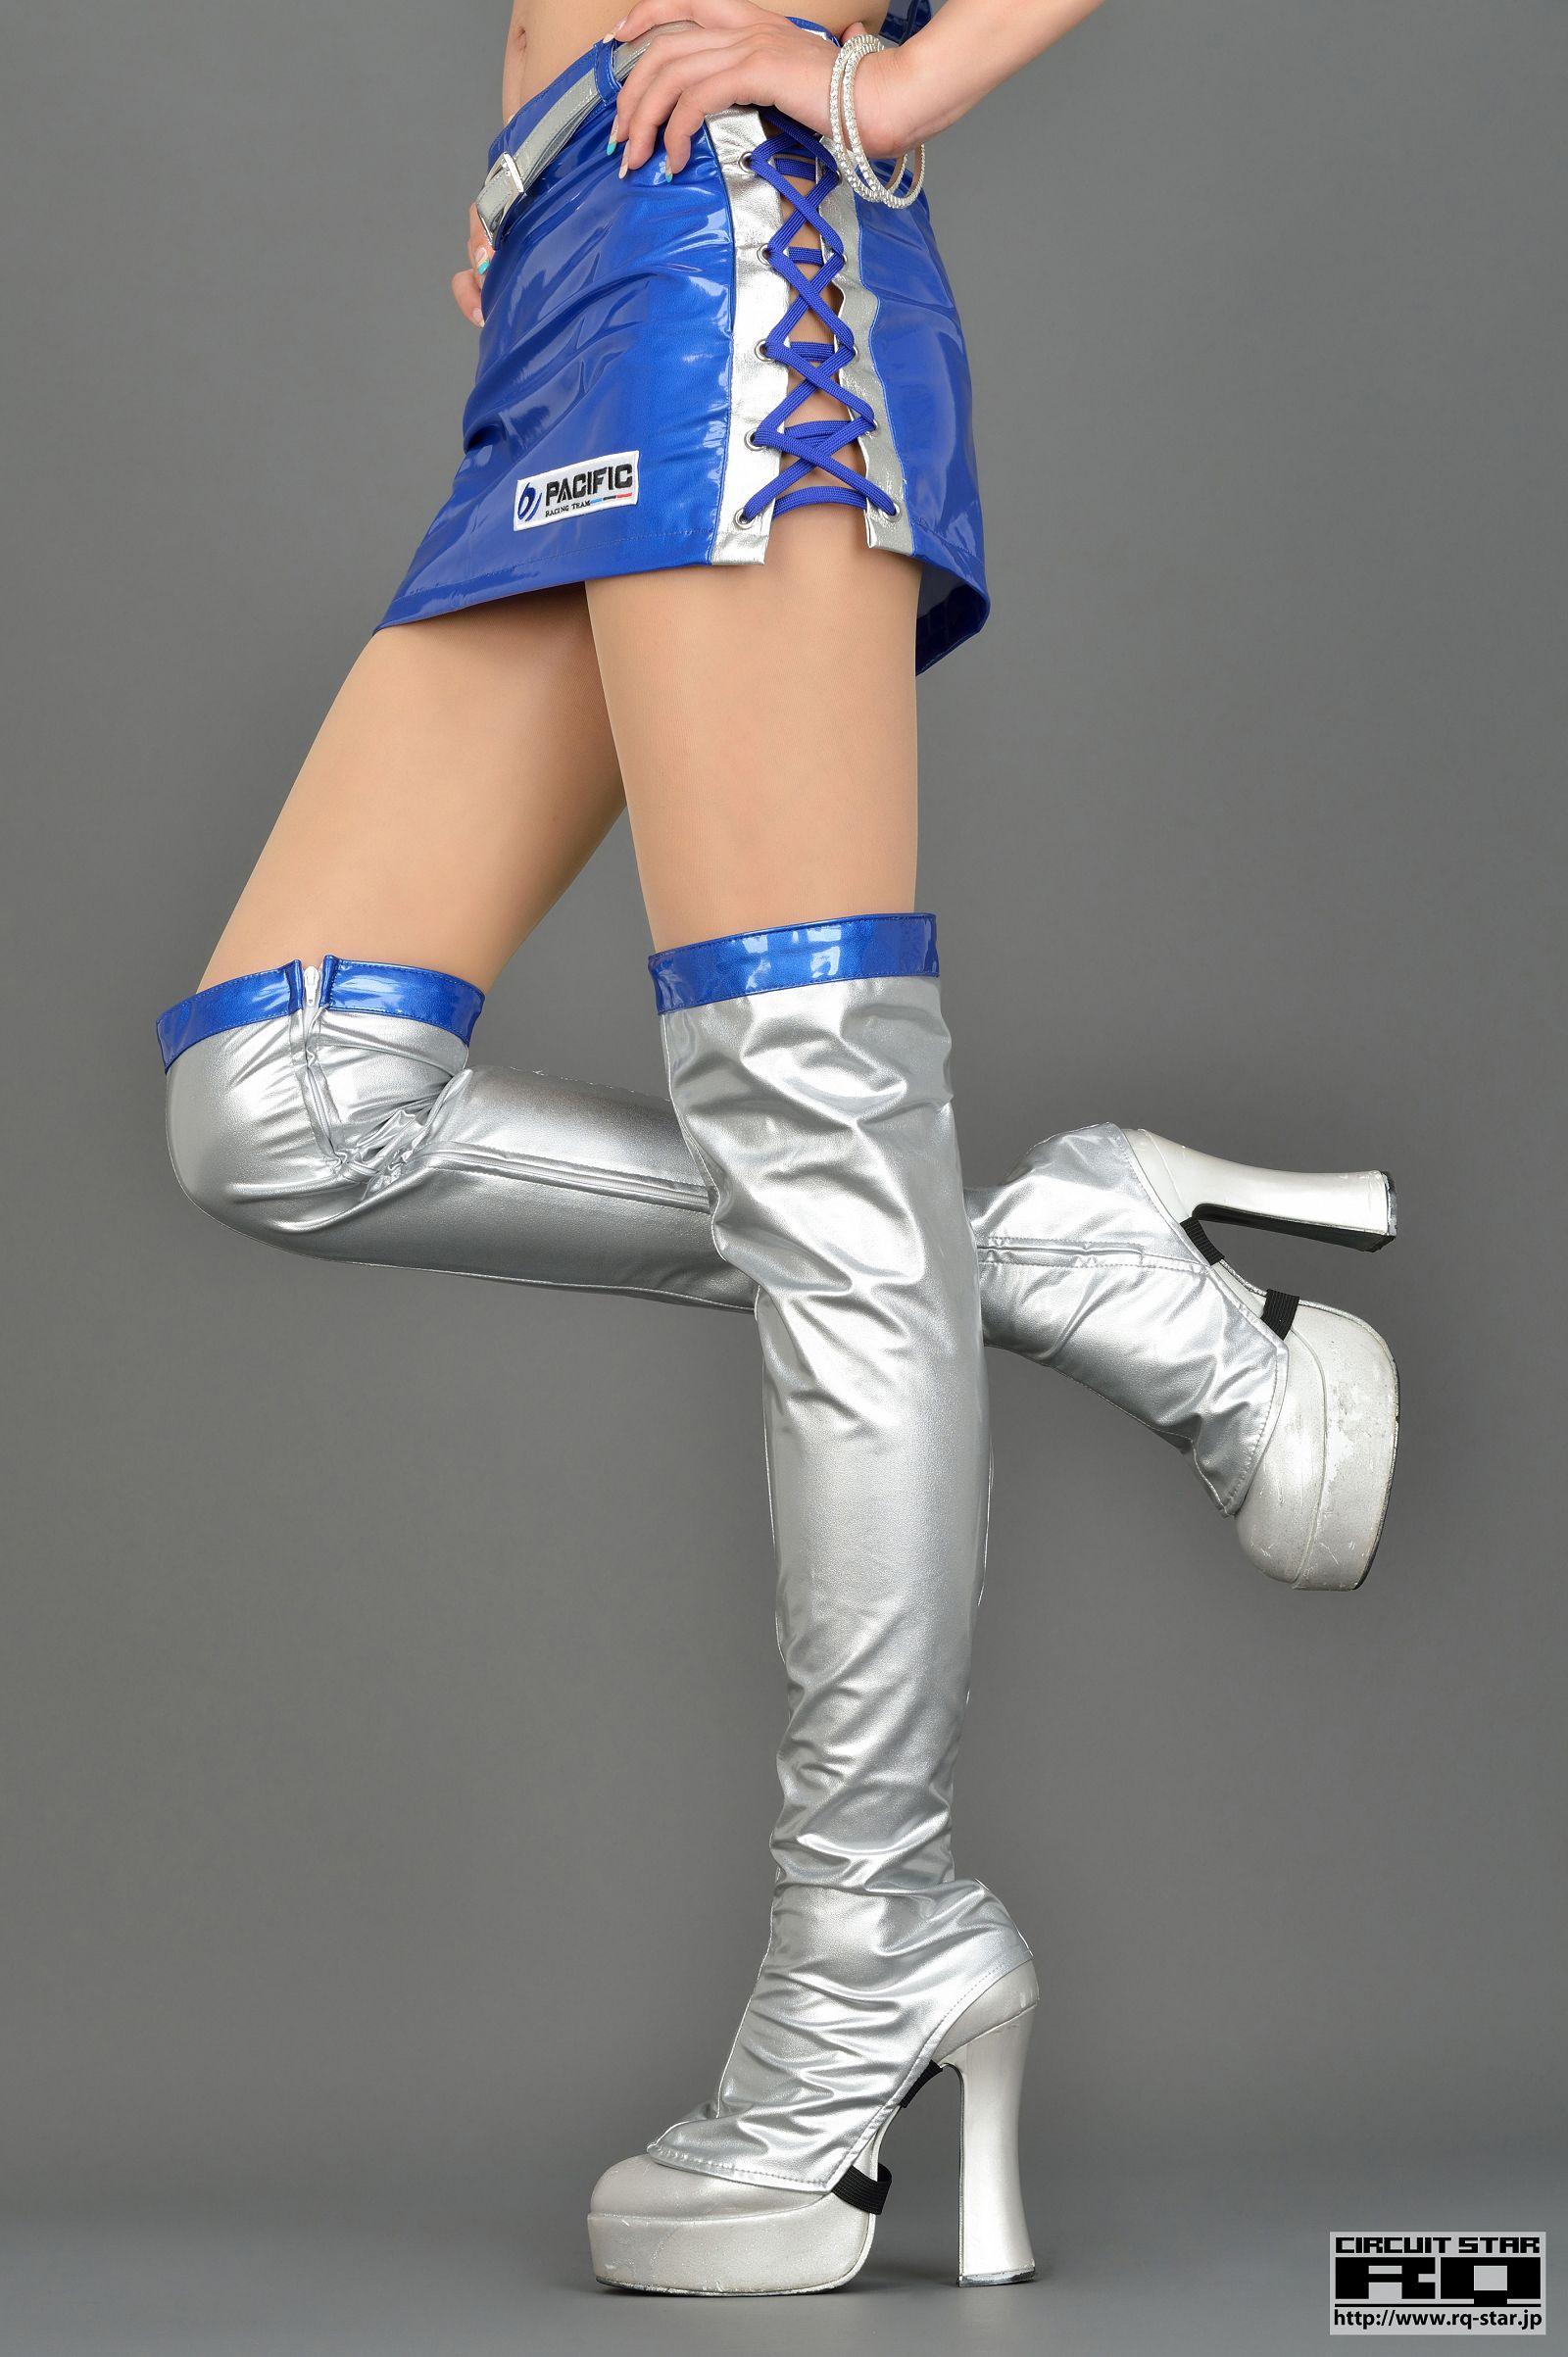 [RQ STAR美女] NO.00720 Yui Iwasaki 岩崎由衣 Race Queen[94P] RQ STAR 第4张